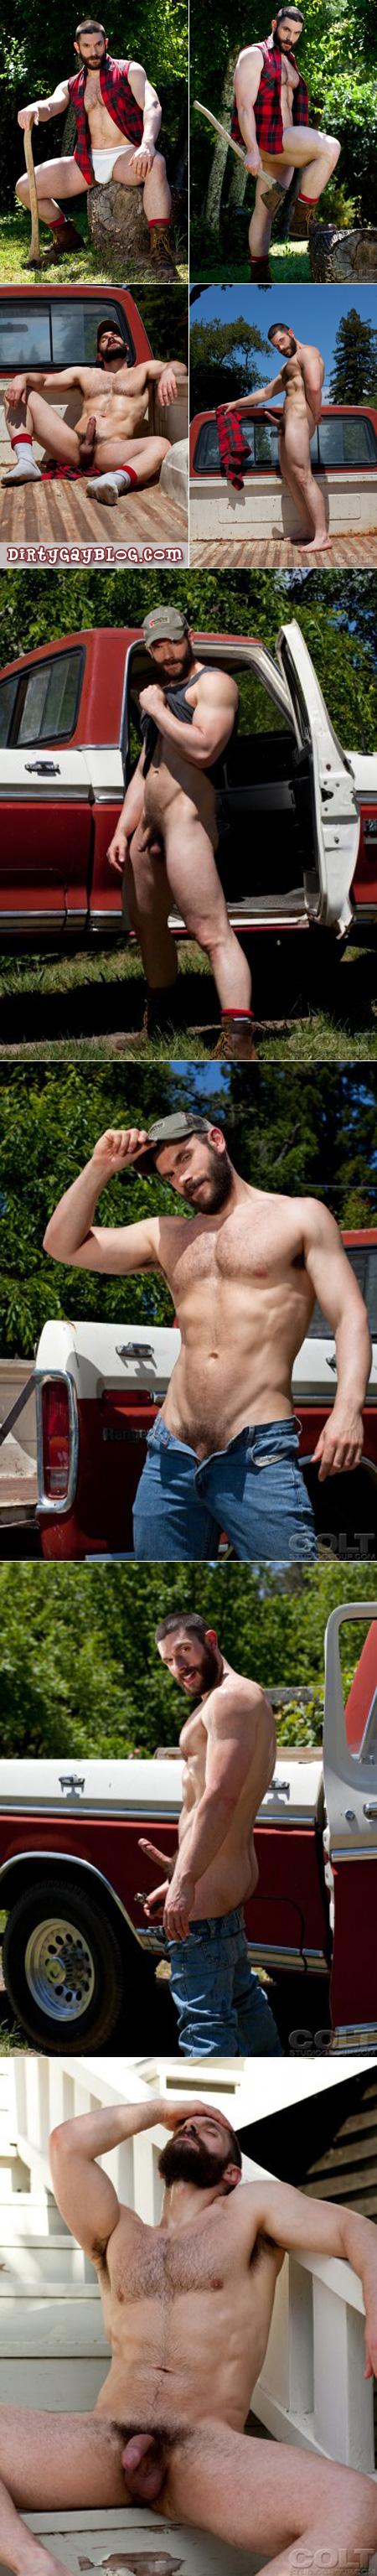 Hairy, bearded lumberjack gets naked in his pickup truck.